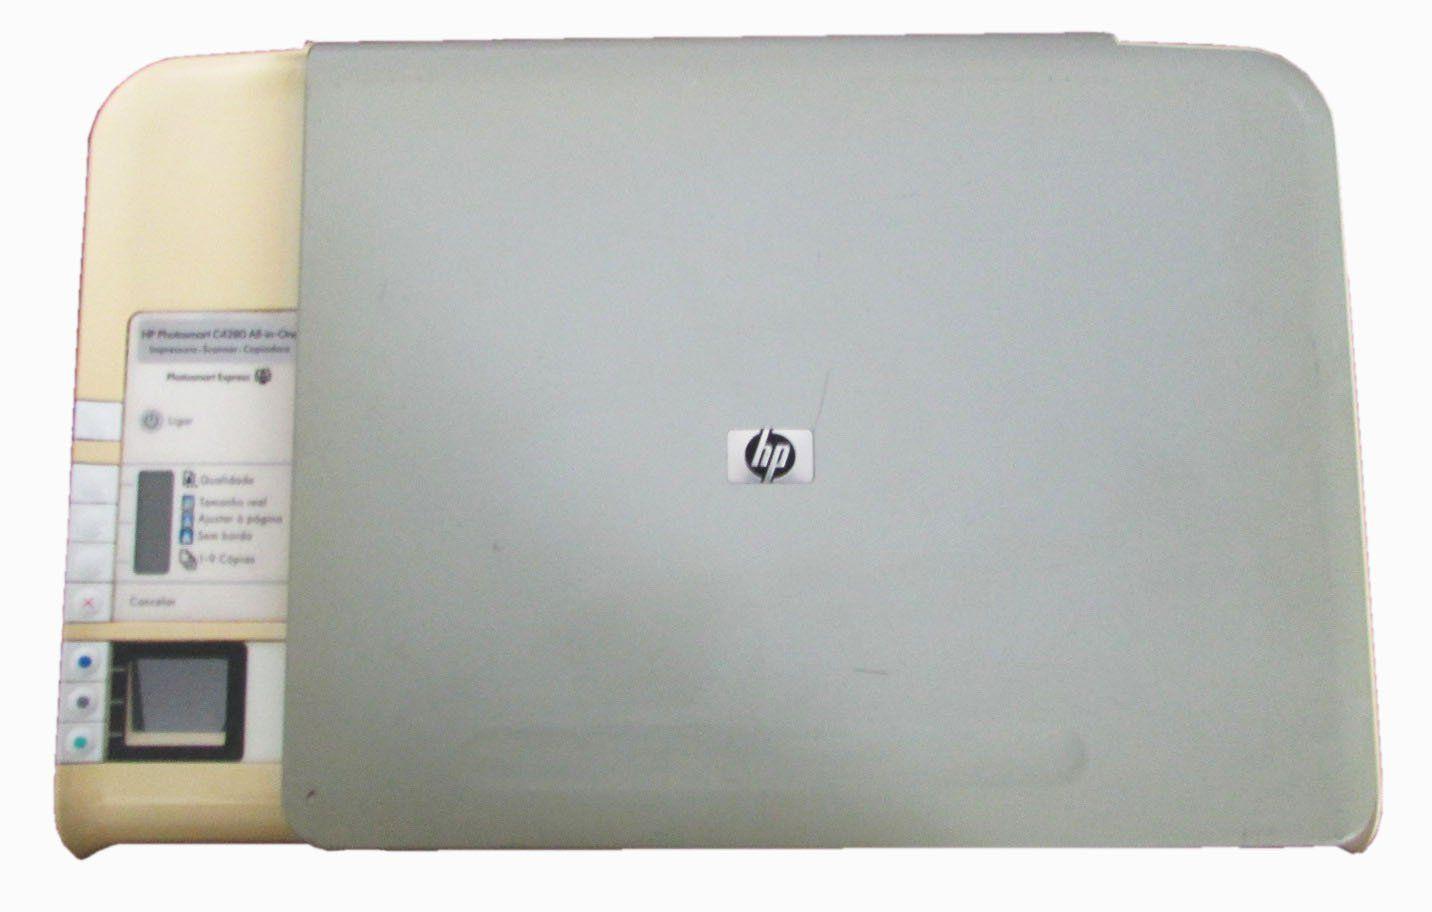 Carcaça Superior C/ Painel de Impressora HP Photosmart C4280 (semi novo)